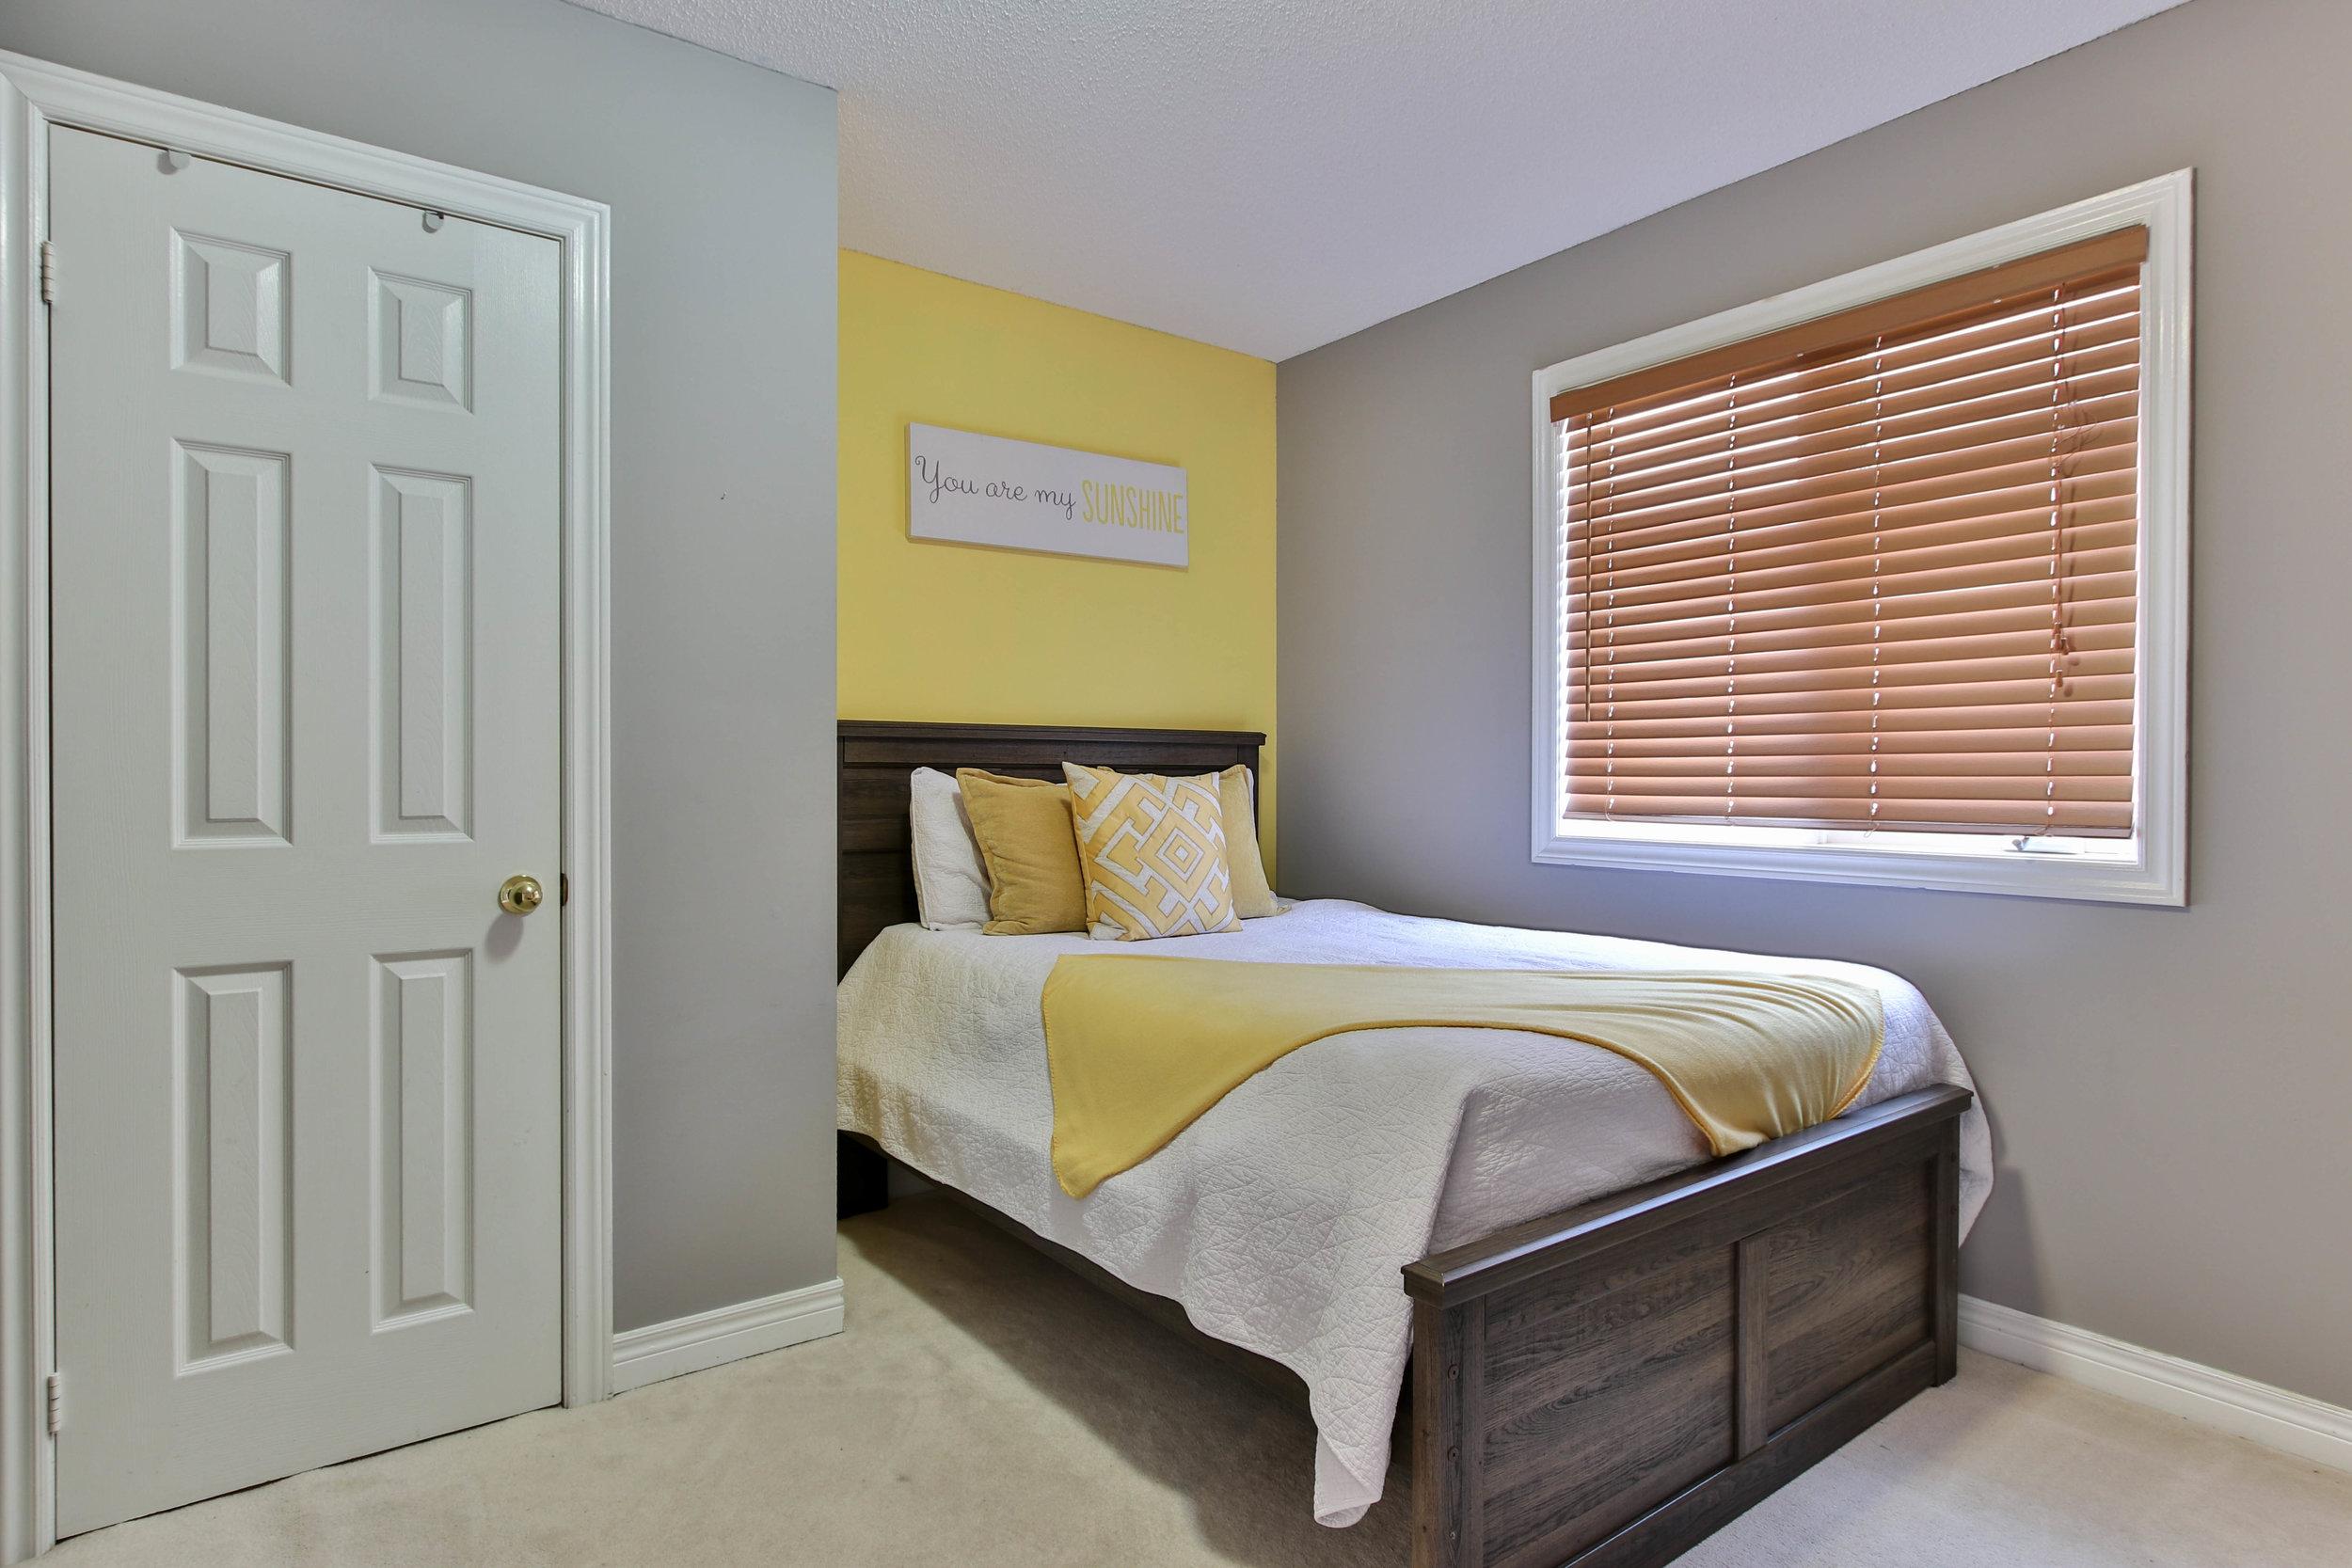 34_Bedroom (1 of 1).jpg